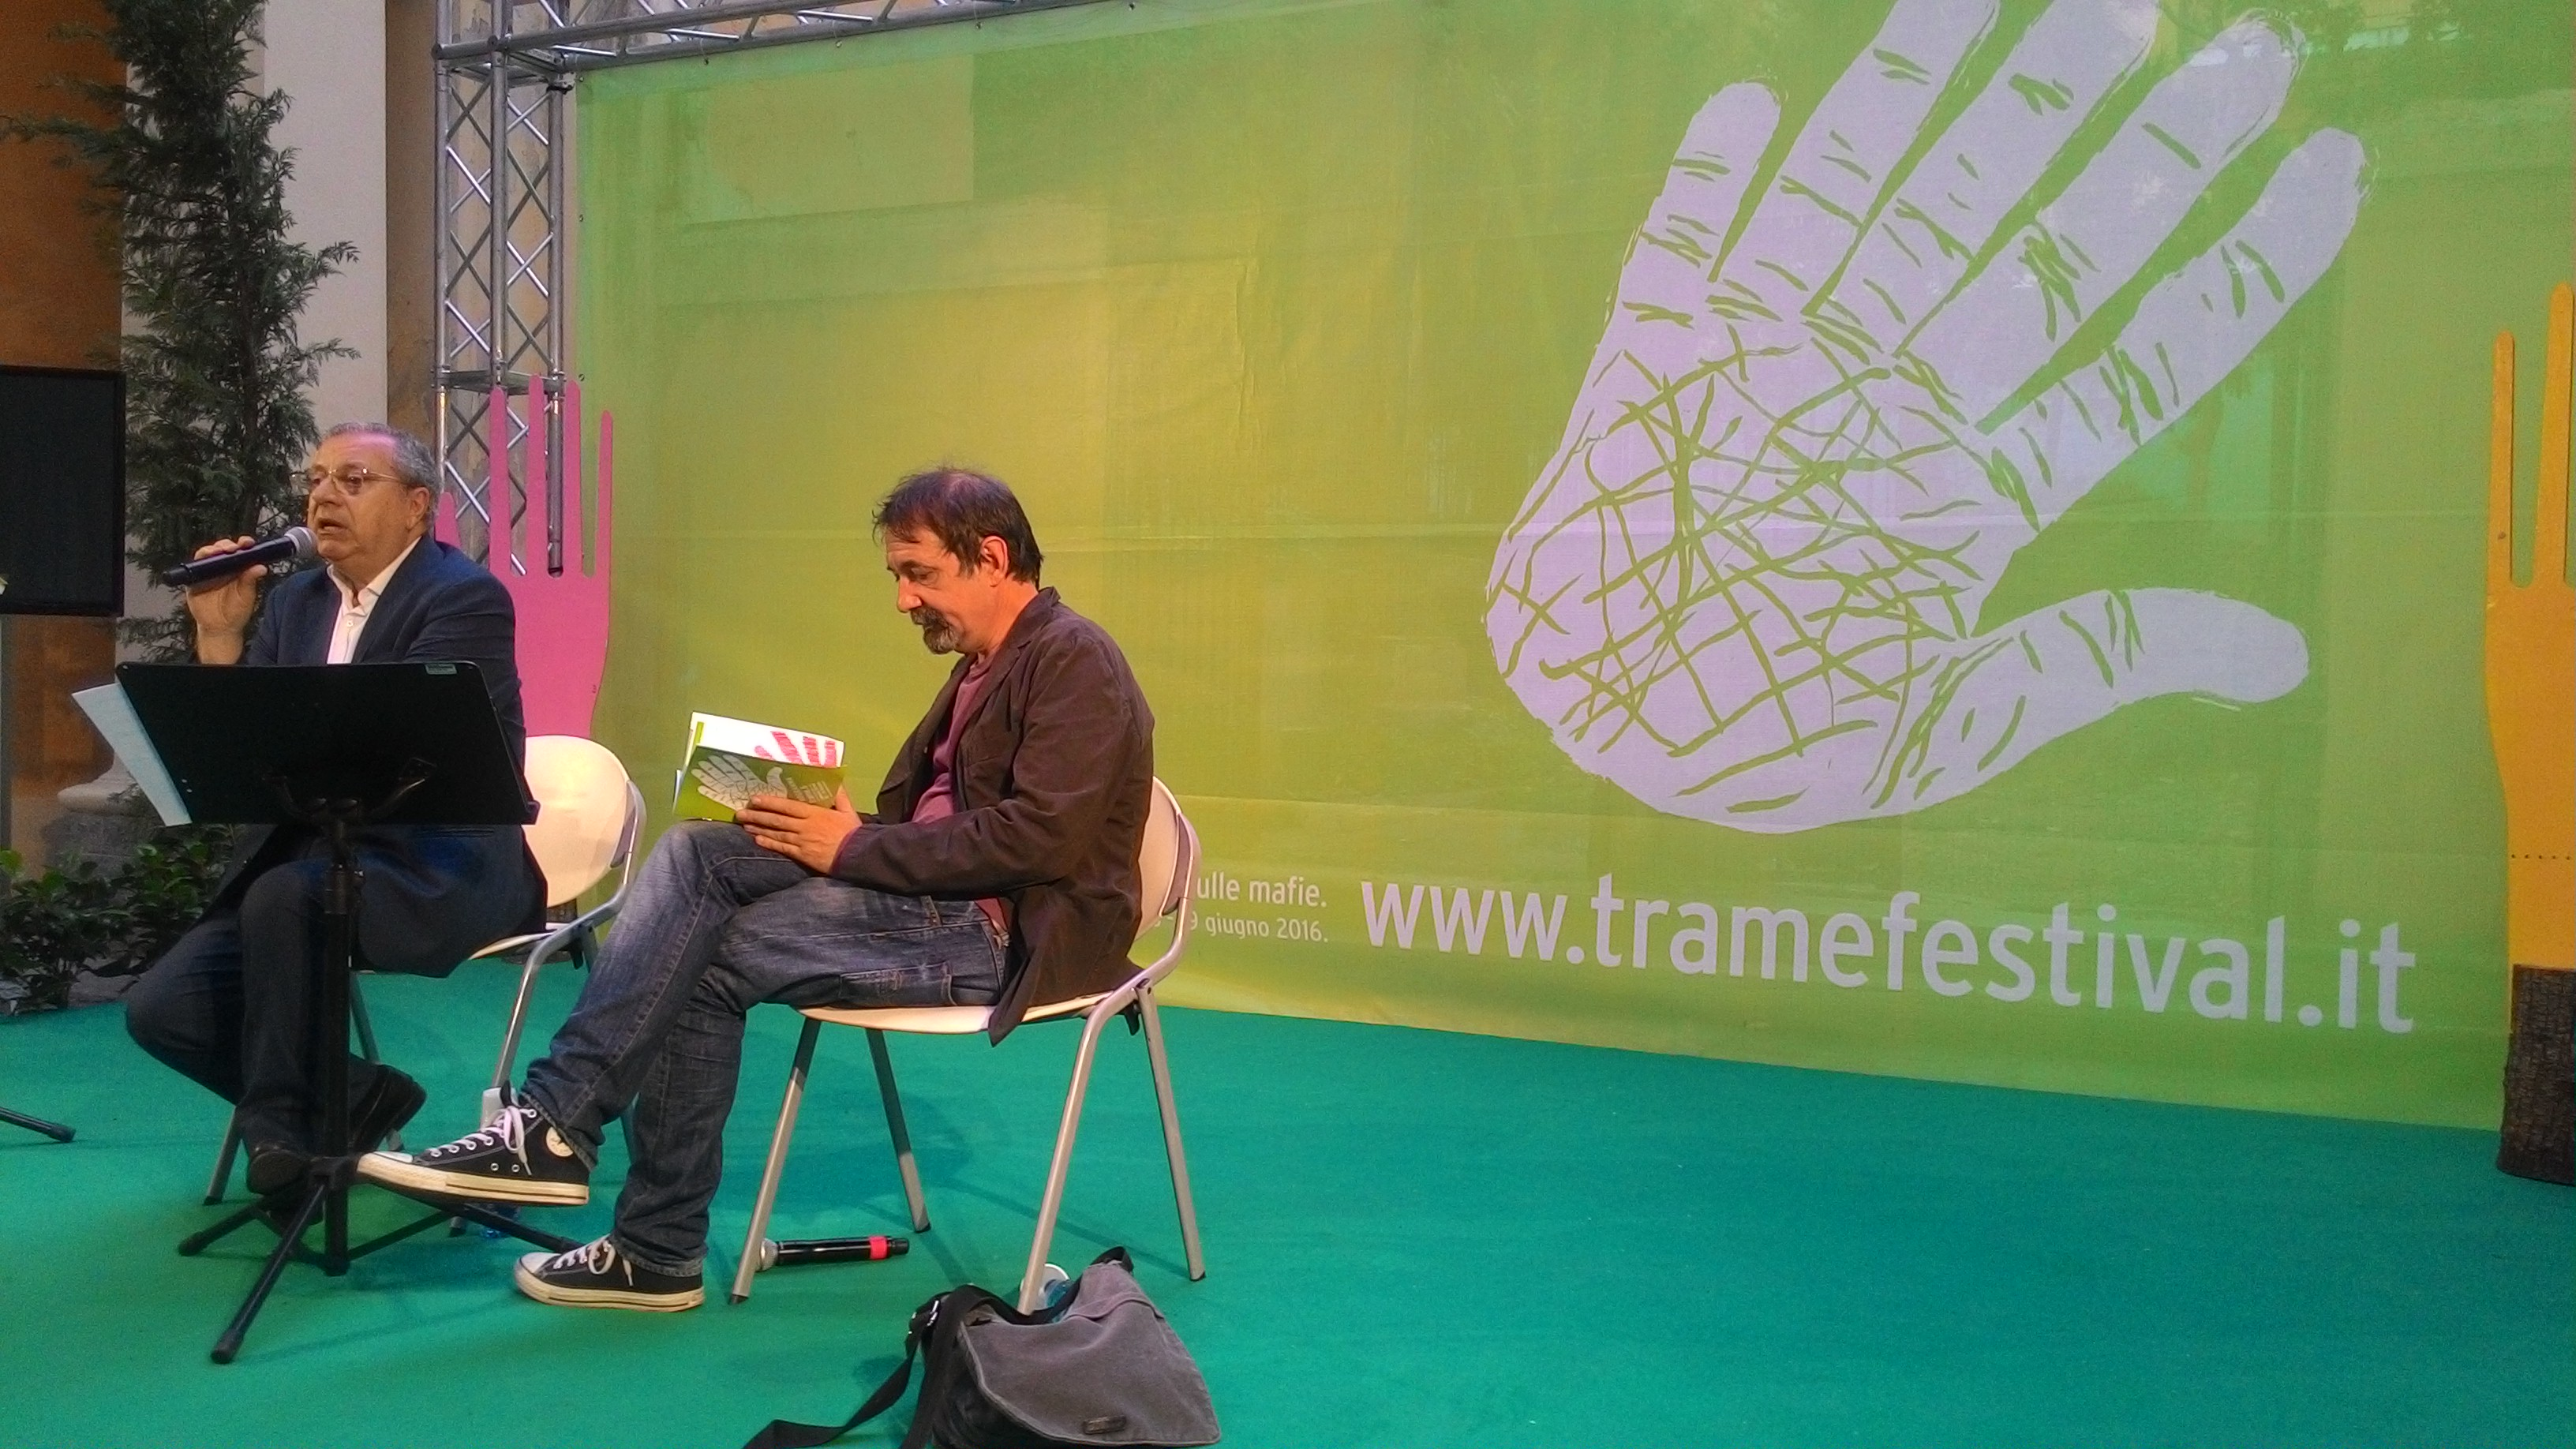 Emanuele Trevi, Luigi Saitta